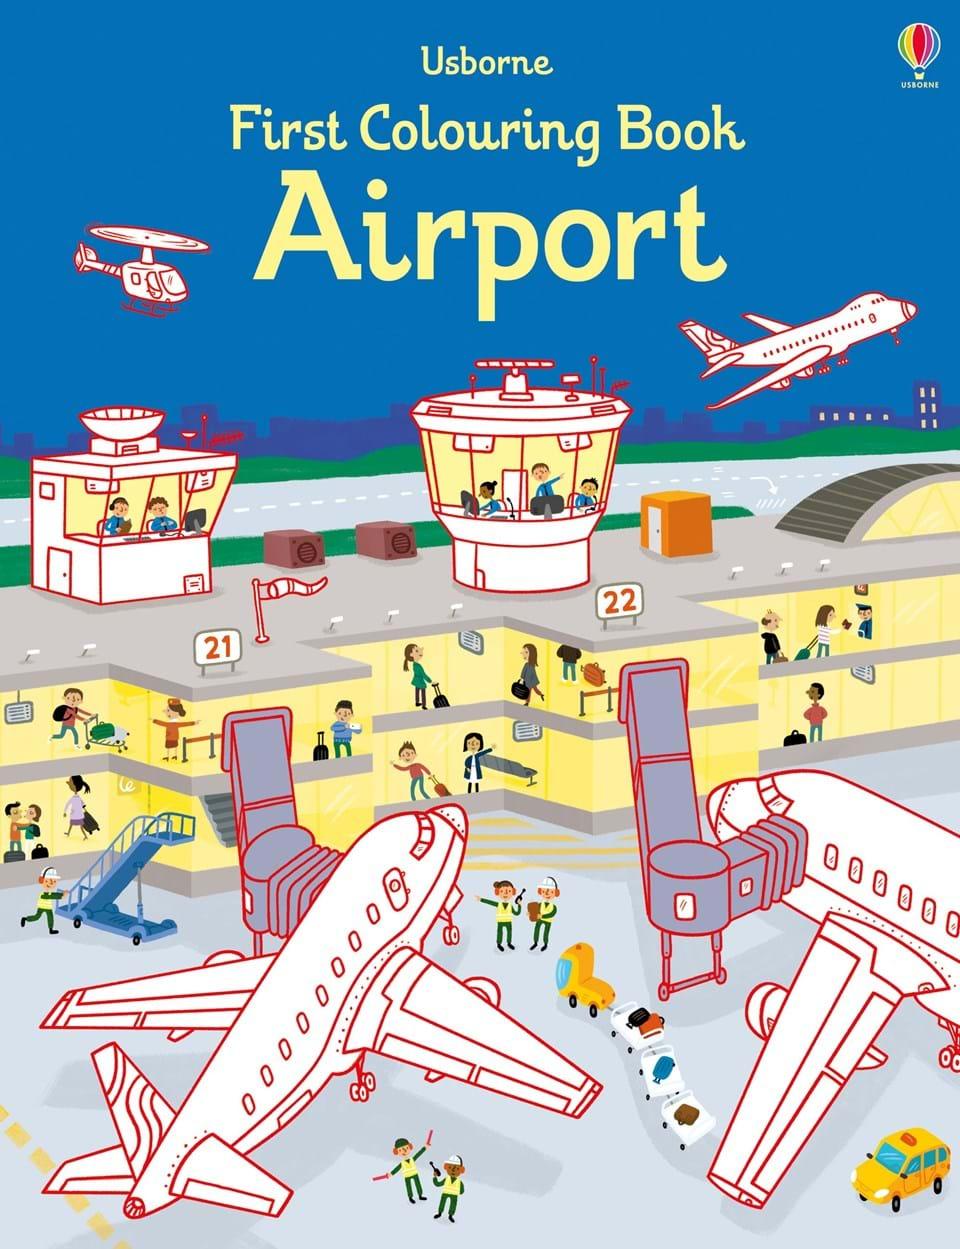 Airport 0367 sluban 678pcs city series international airport model building blocks enlighten figure toys for children compatible legoe